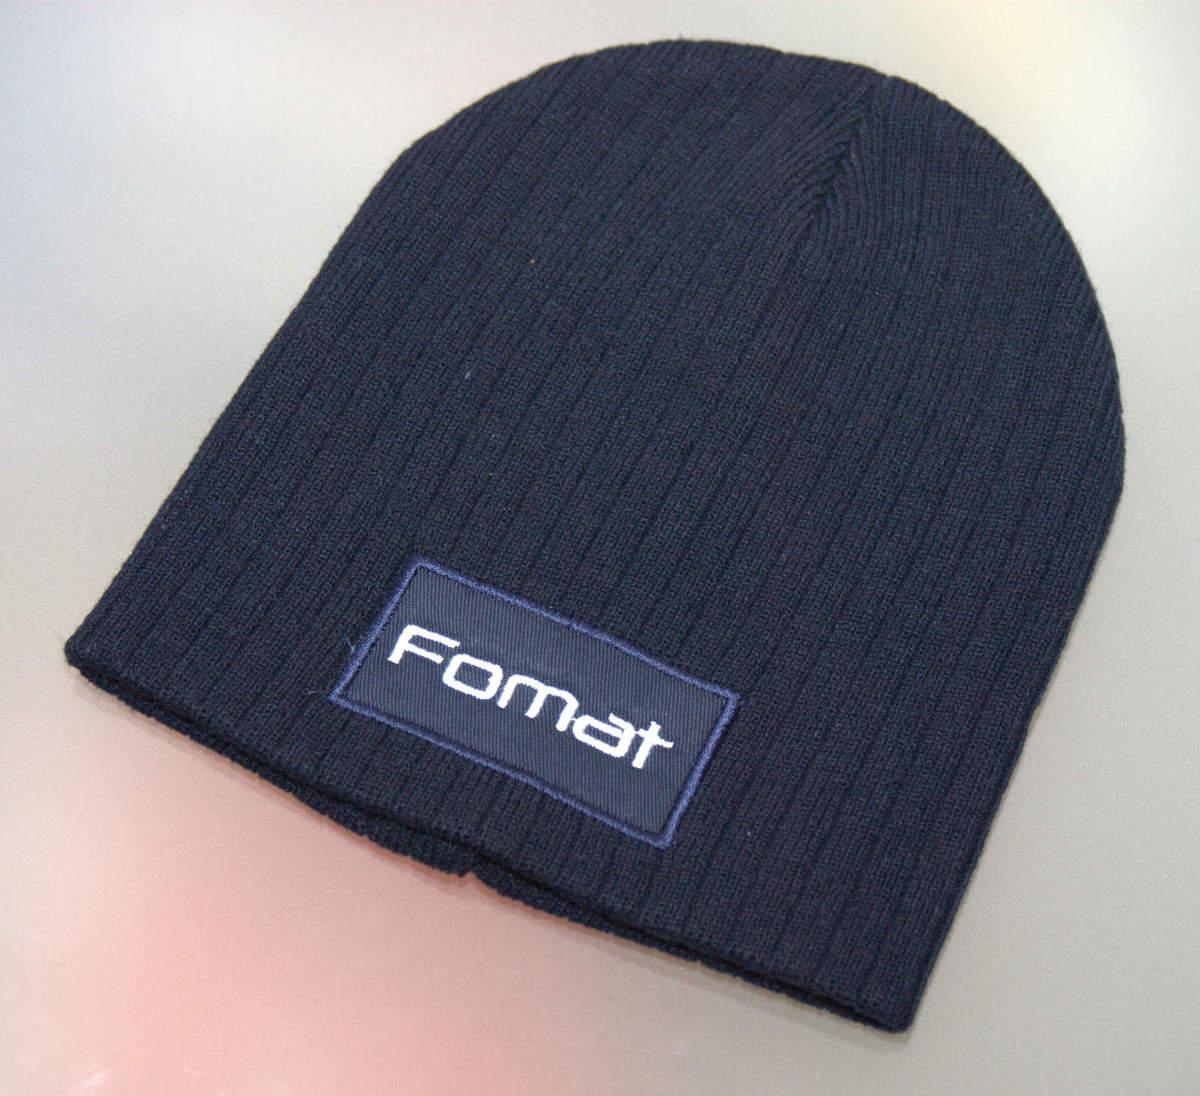 1bc5e0cc2 Pletená čiapka pre firmu Fomat Bardejov | LAJKA®